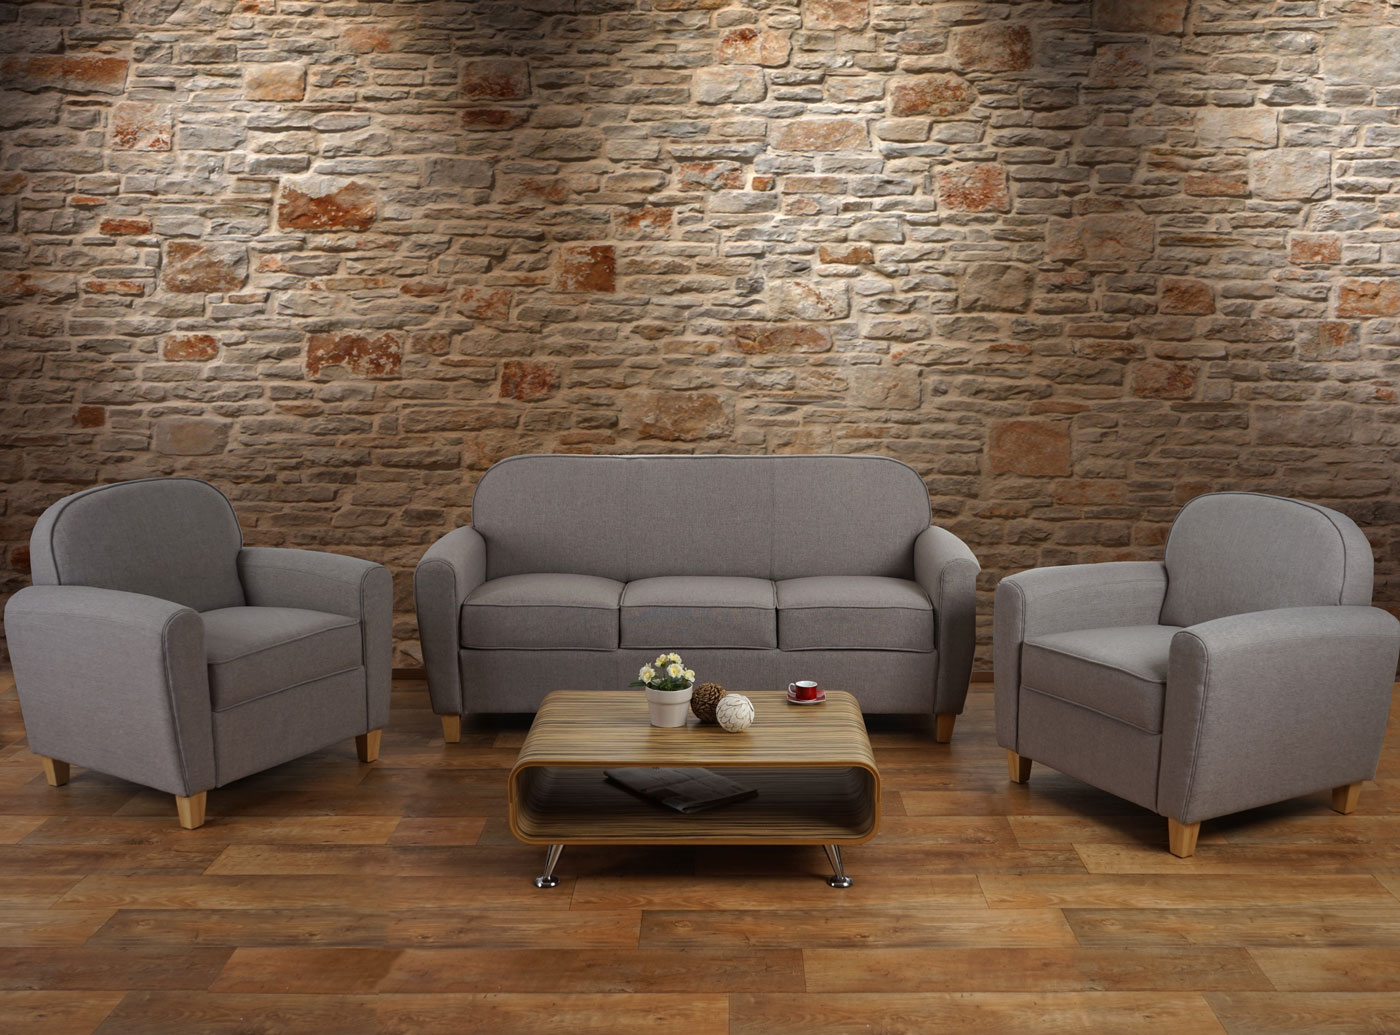 3 1 1 sofagarnitur malm t377 couch loungesofa retro. Black Bedroom Furniture Sets. Home Design Ideas